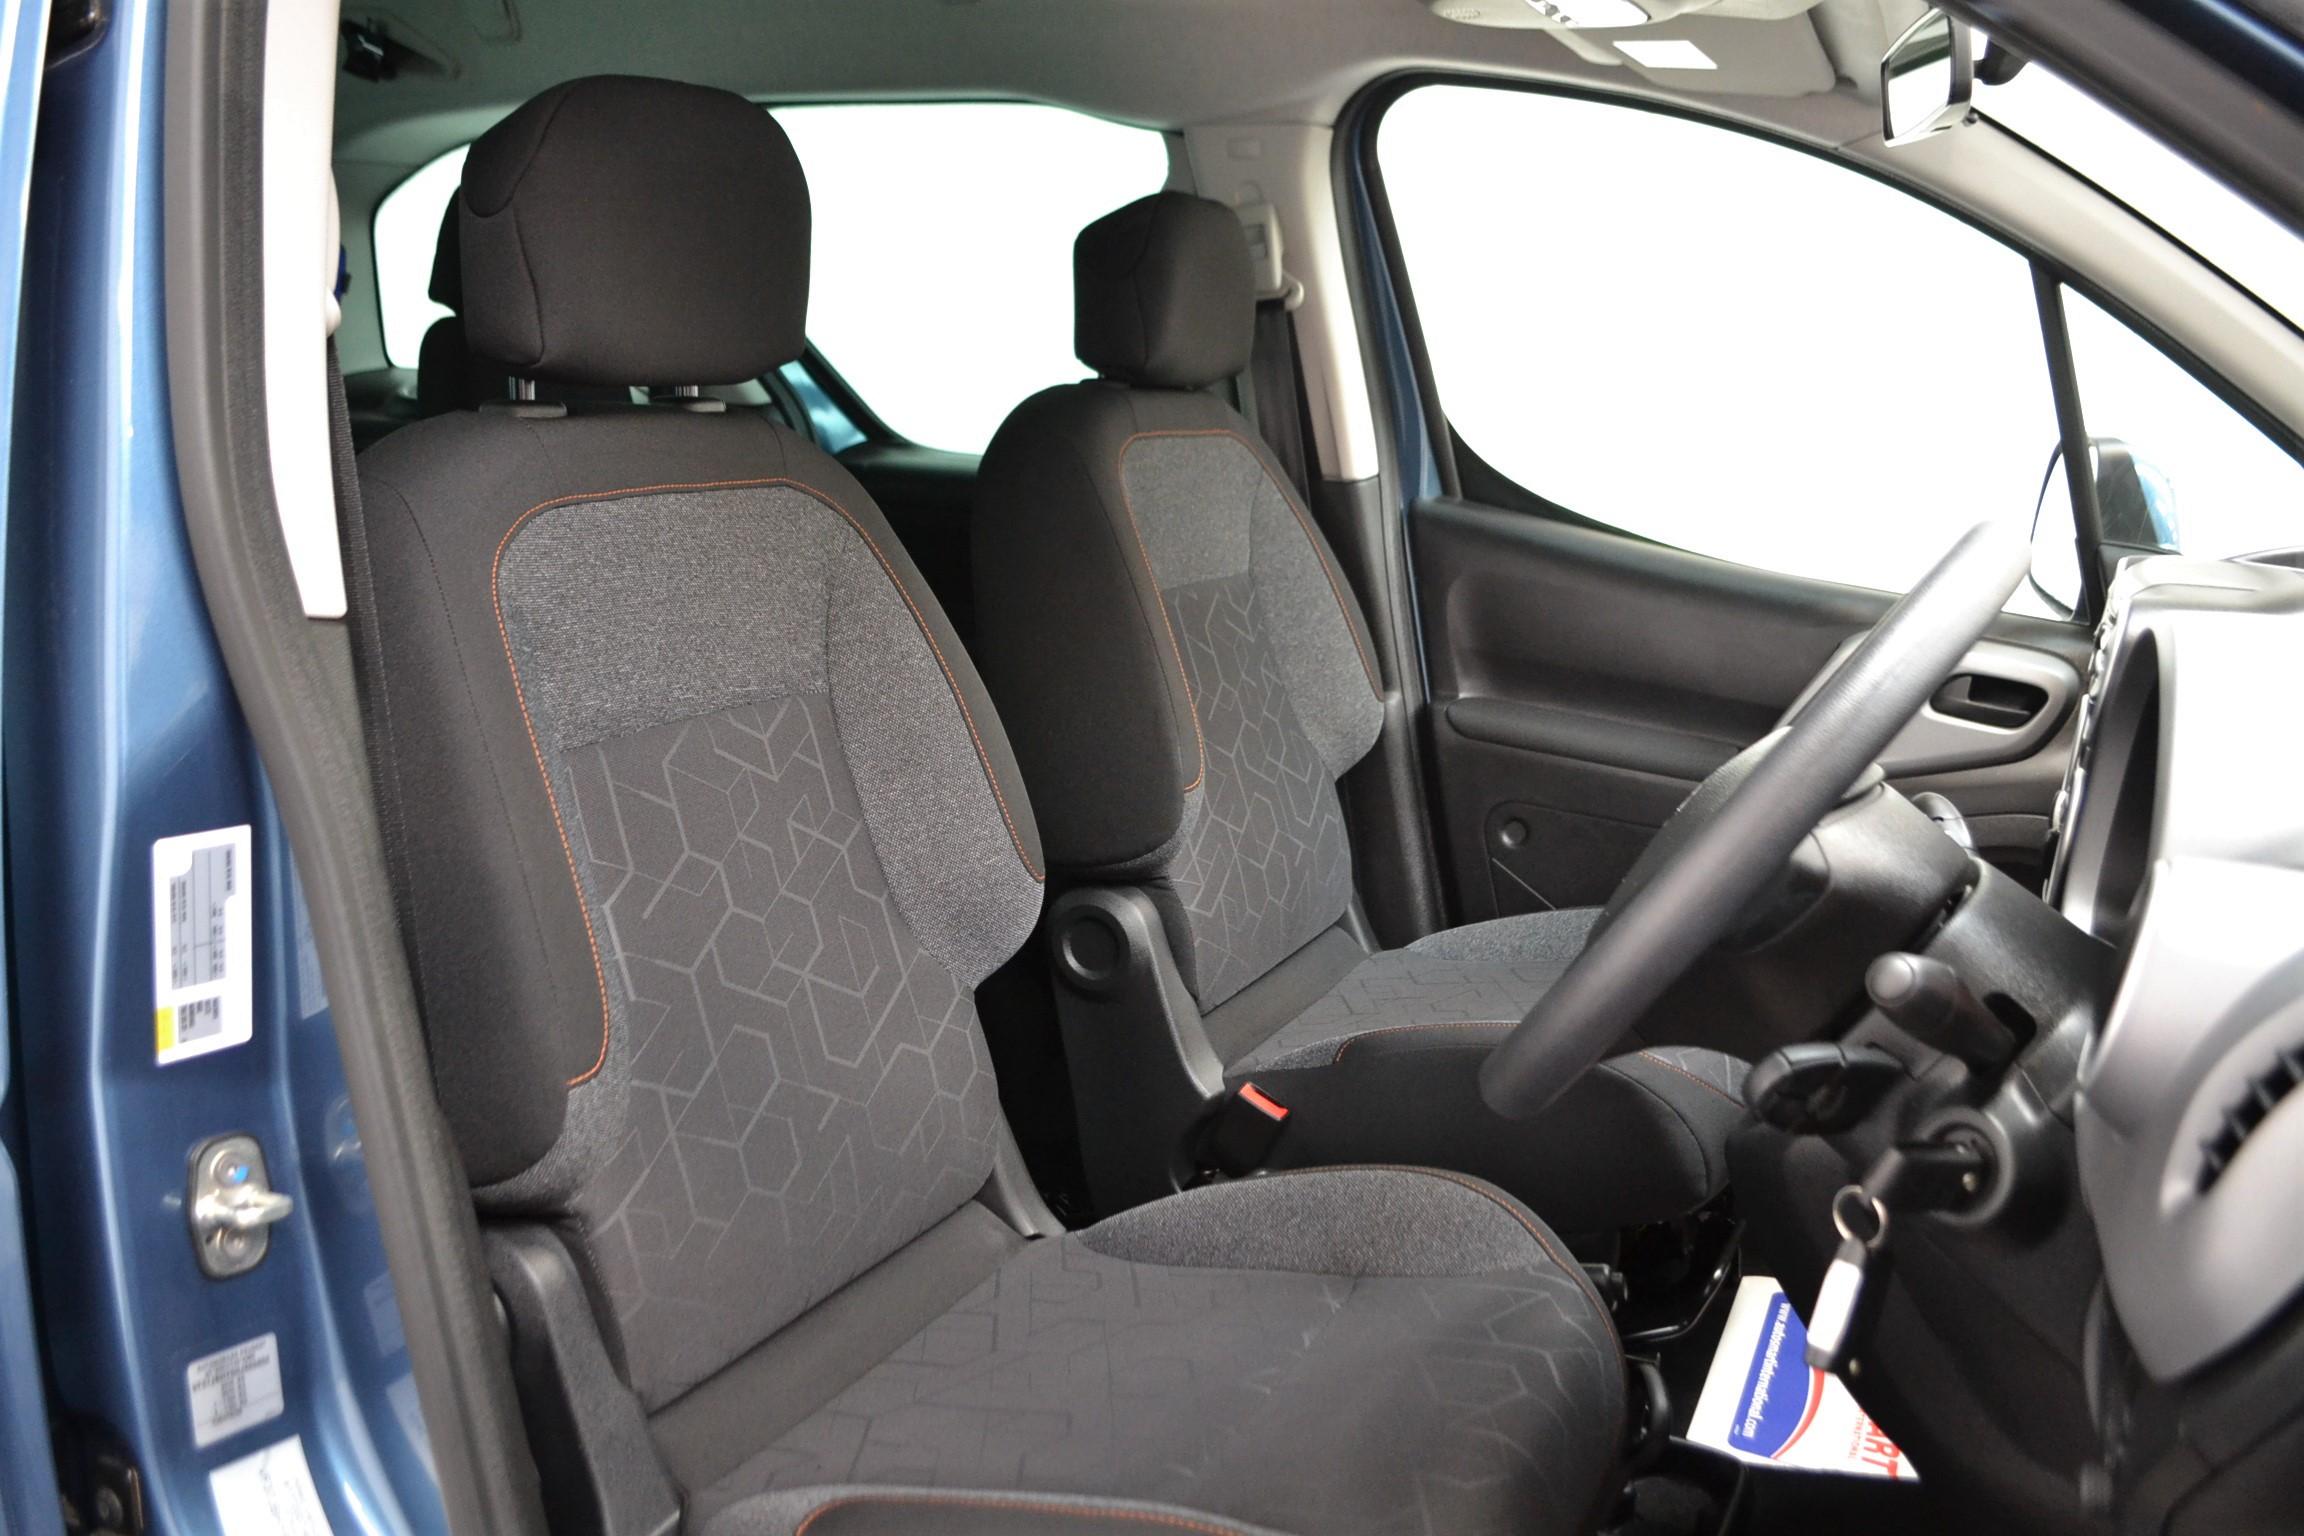 WAV Cars For Sale Bristol Wheelchair Accessible Vehicles Used For Sale Somerset Devon Dorset Bath Peugeot Partner SF67 EEA 23